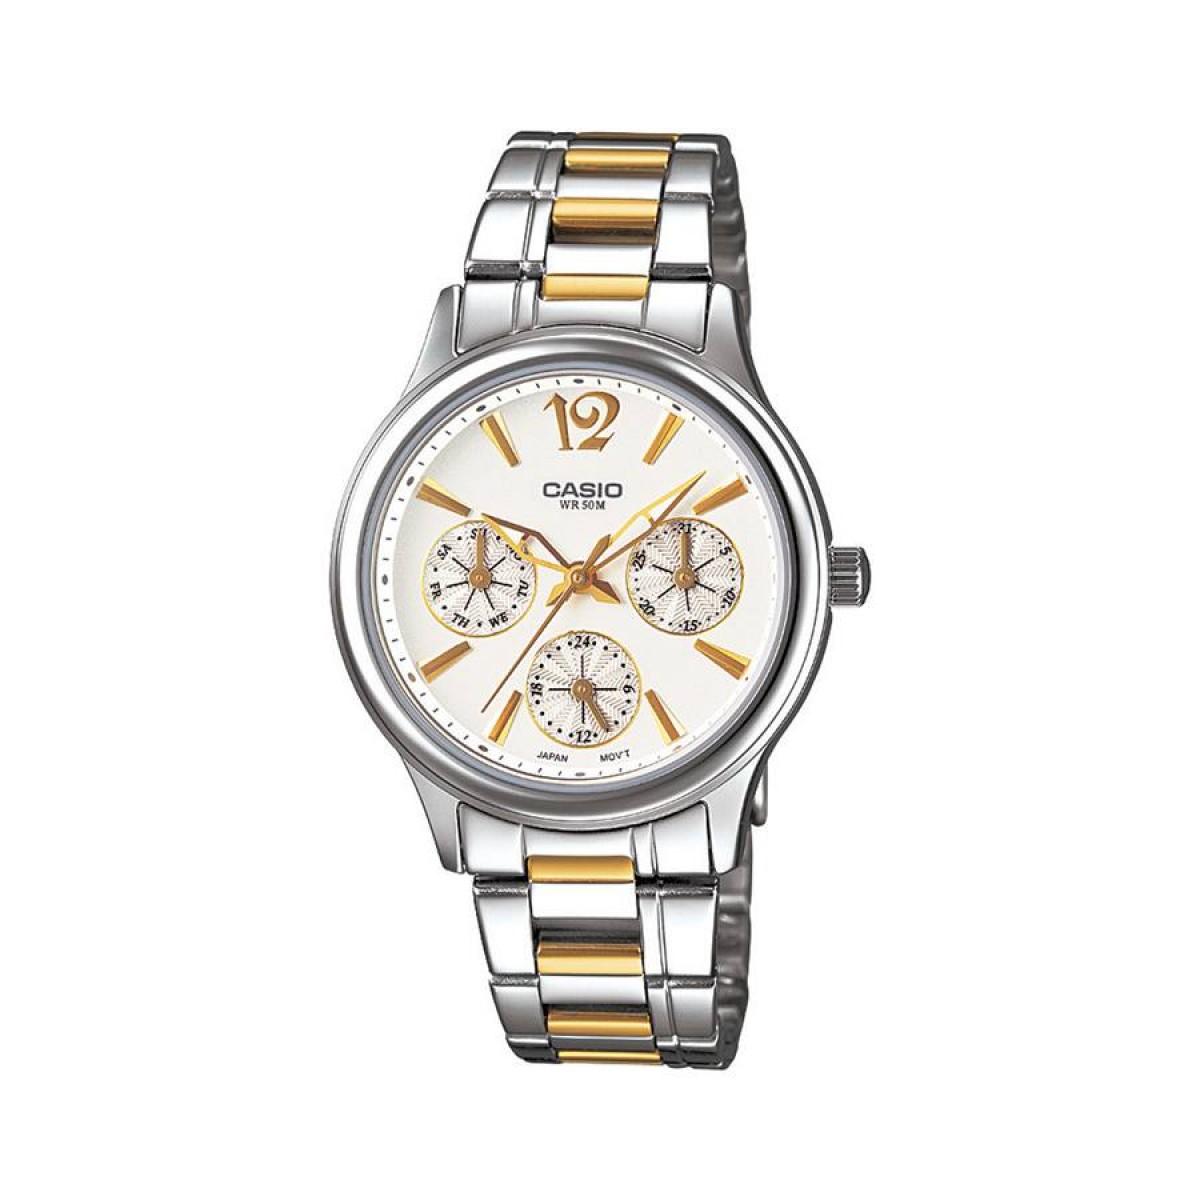 Часовник Casio LTP-2085SG-7AV